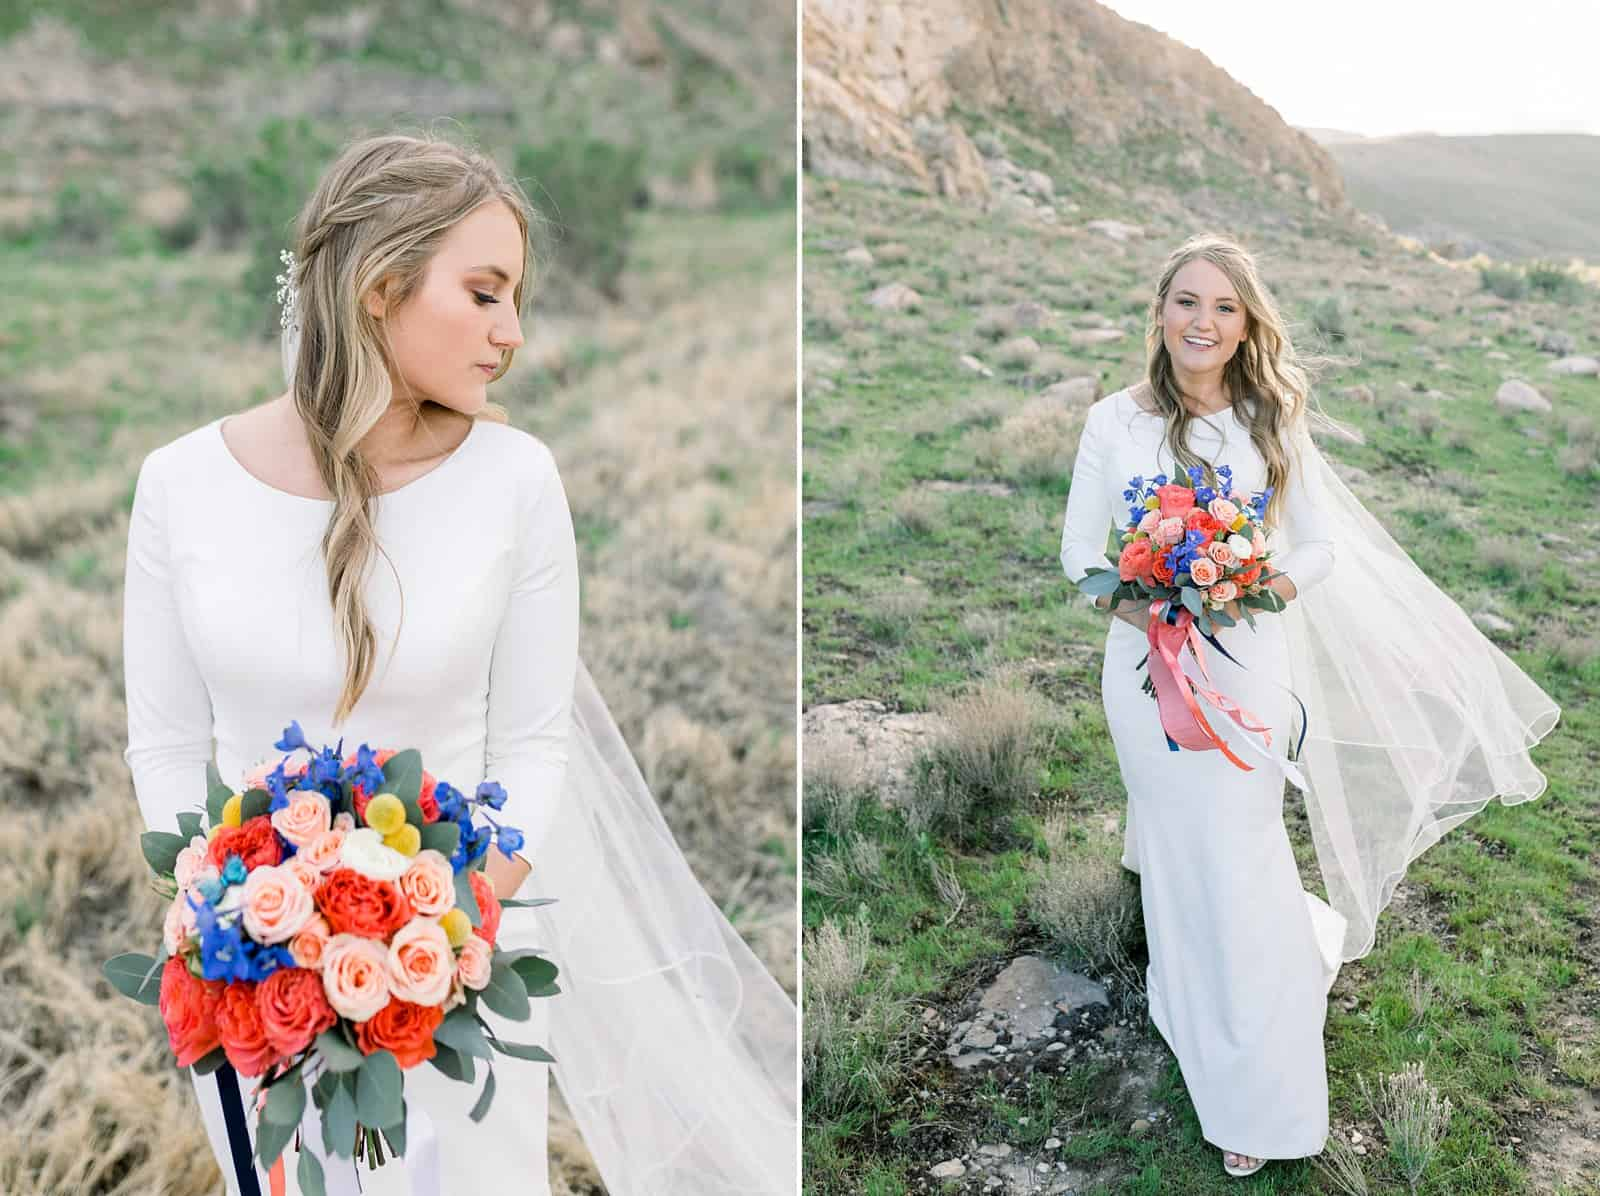 spring wedding, modest wedding dress, LDS bride, Utah wedding photography, long sleeve wedding dress, long hairstyle bridal